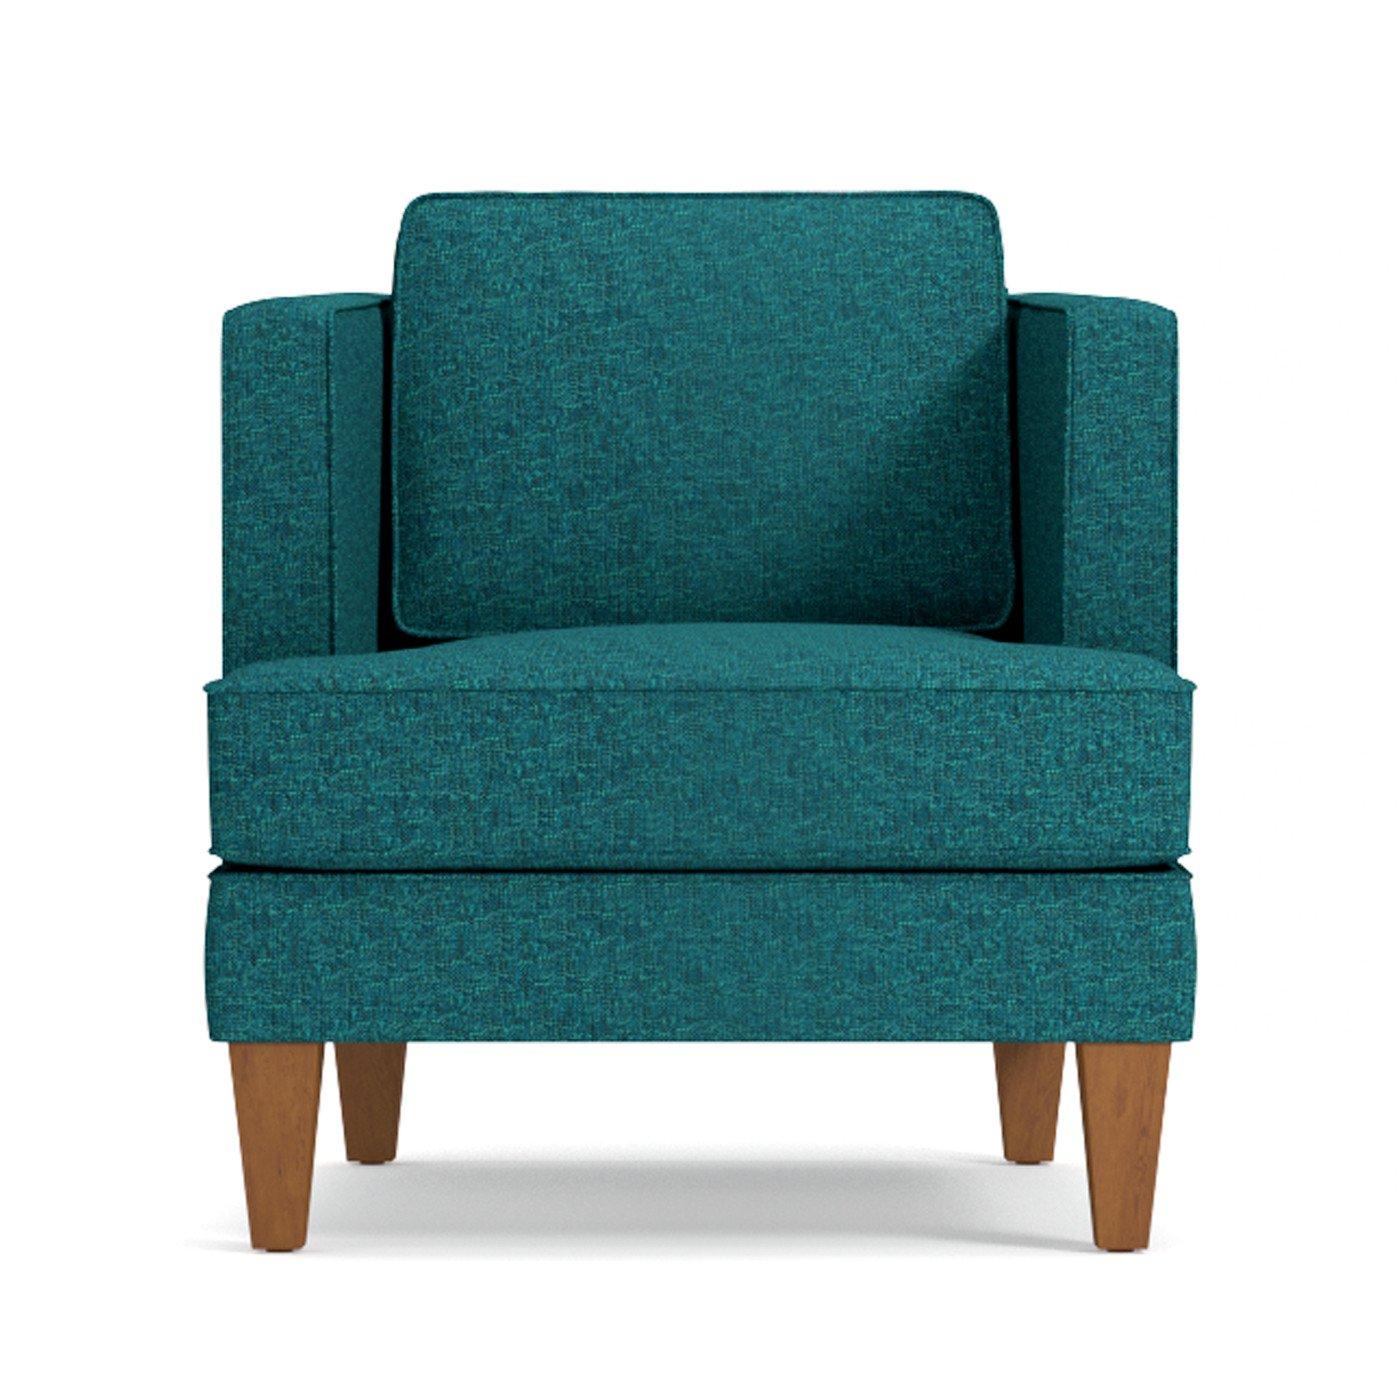 Astor Chair Leg Finish Pecan Chair, Oversized chair